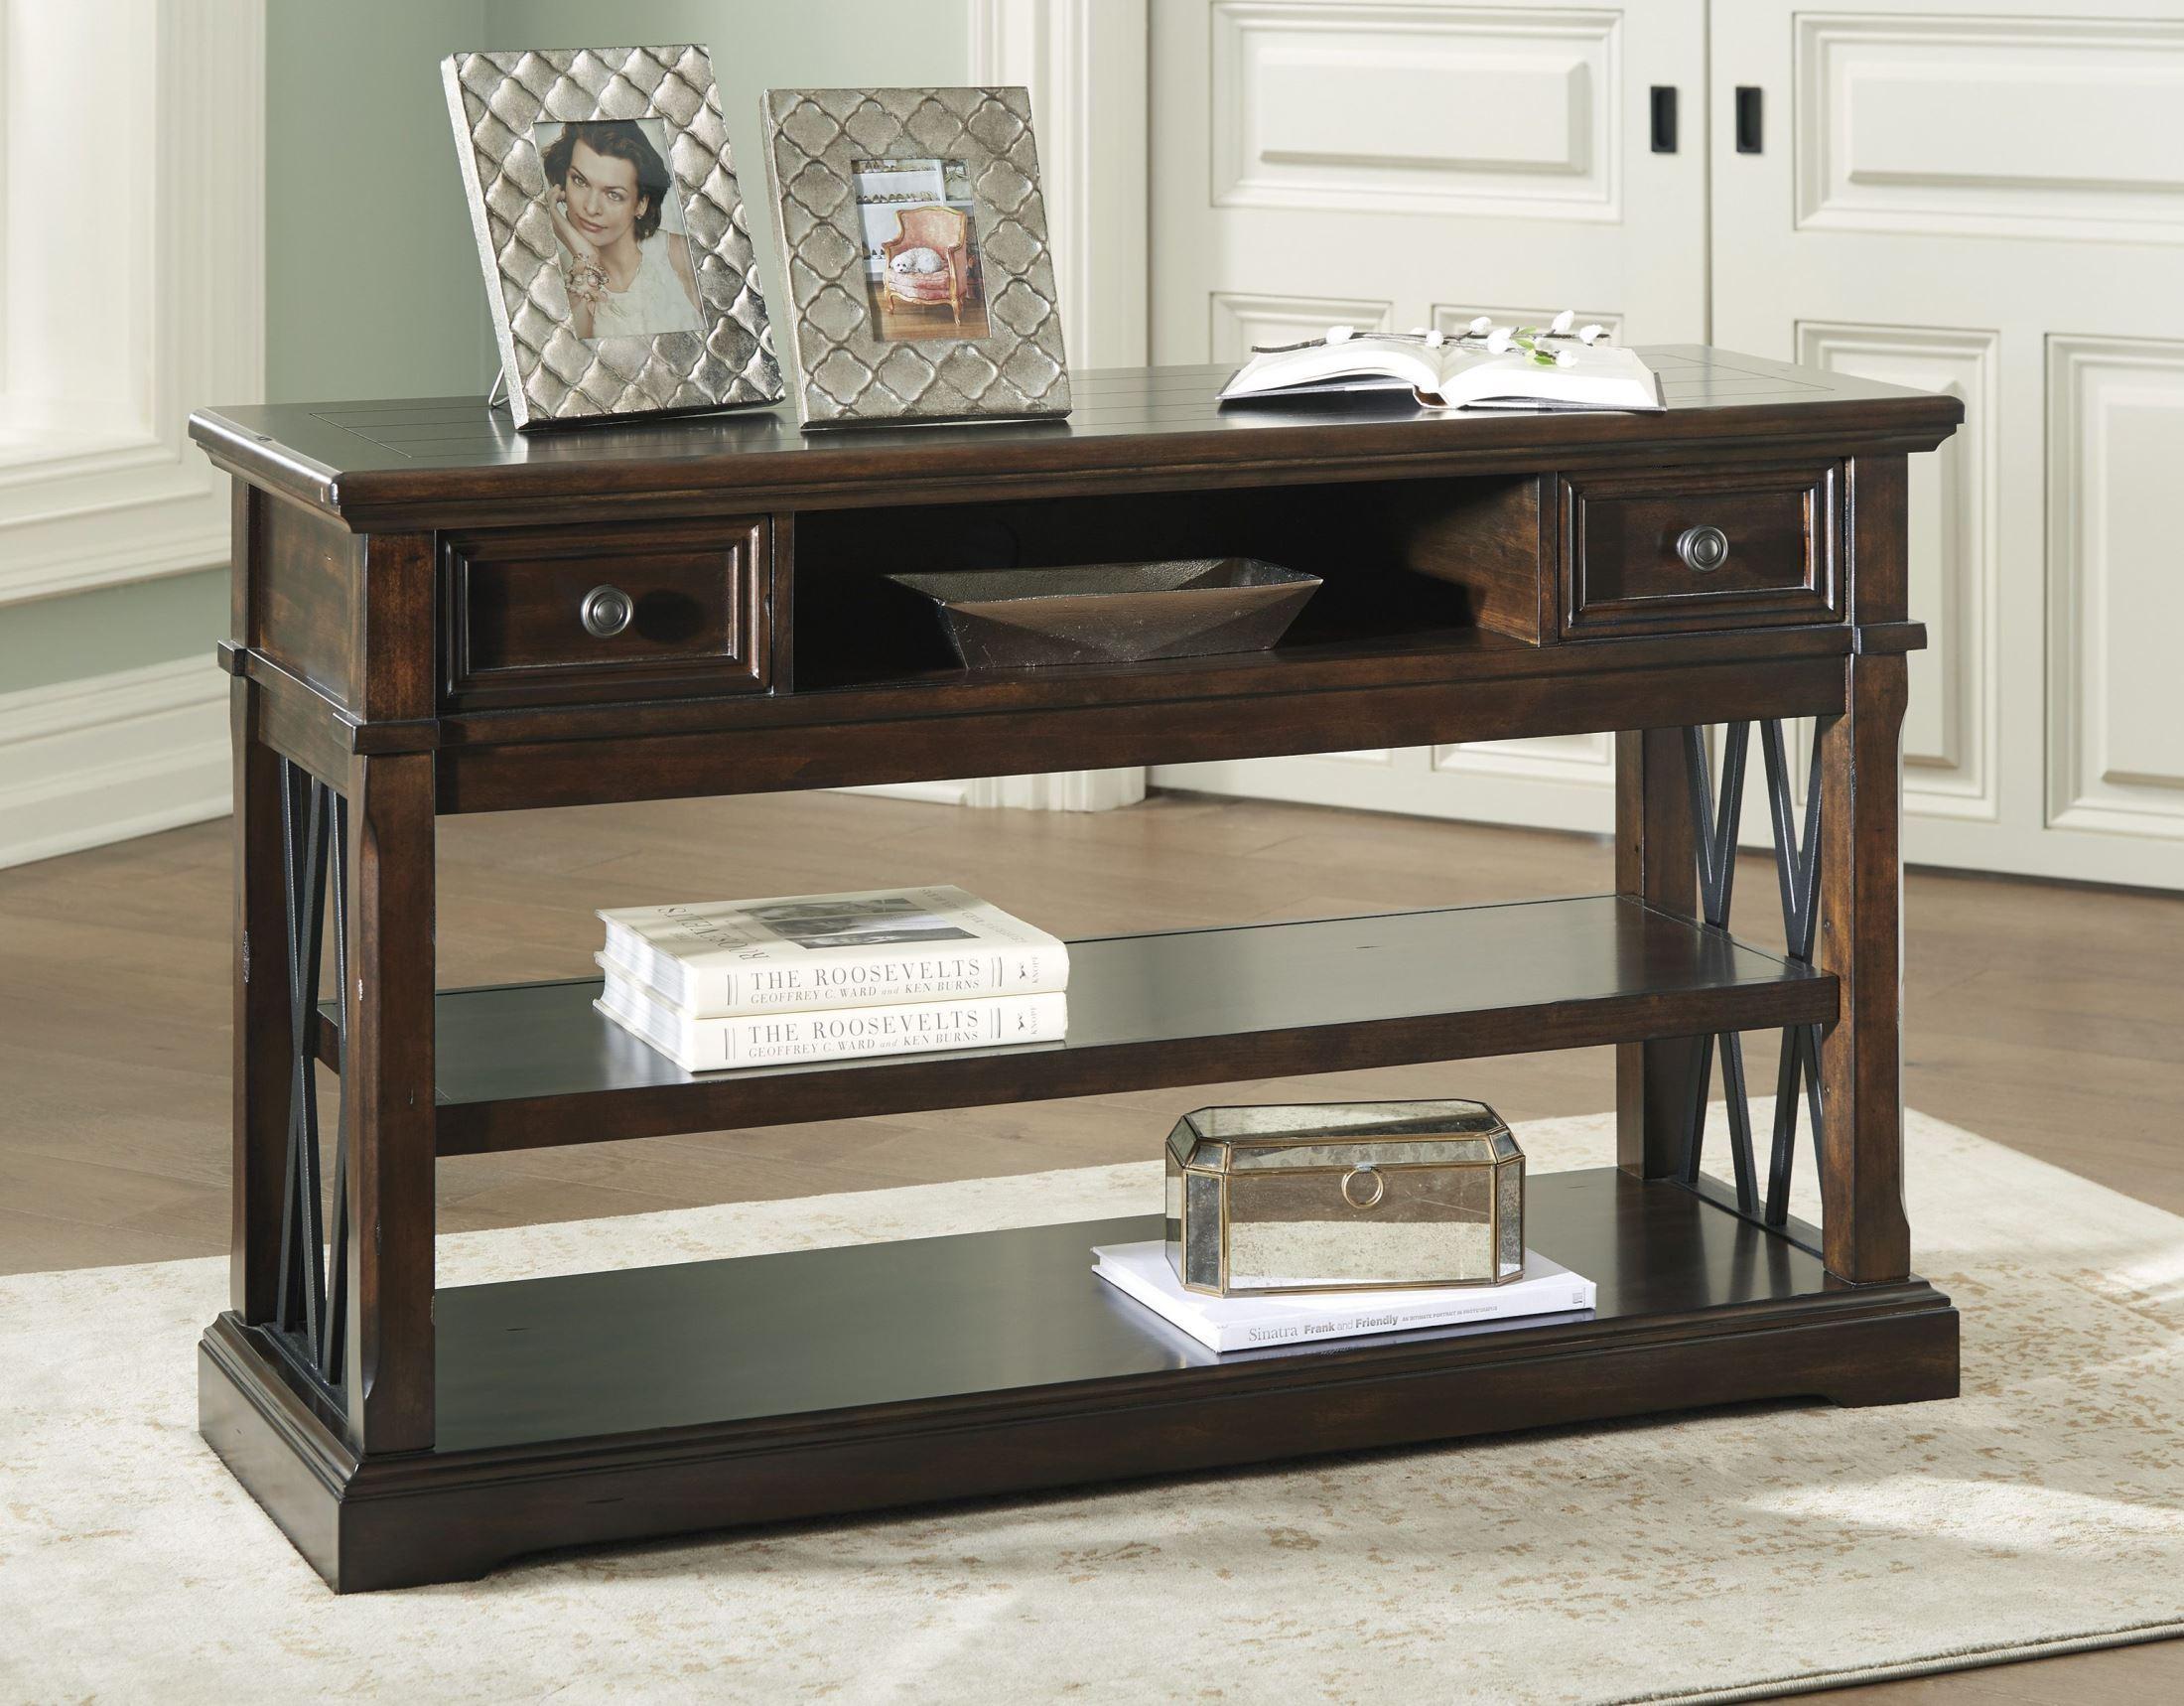 Signature Designashley Roddinton Dark Brown Sofa Table throughout Walters Media Console Tables (Image 21 of 30)